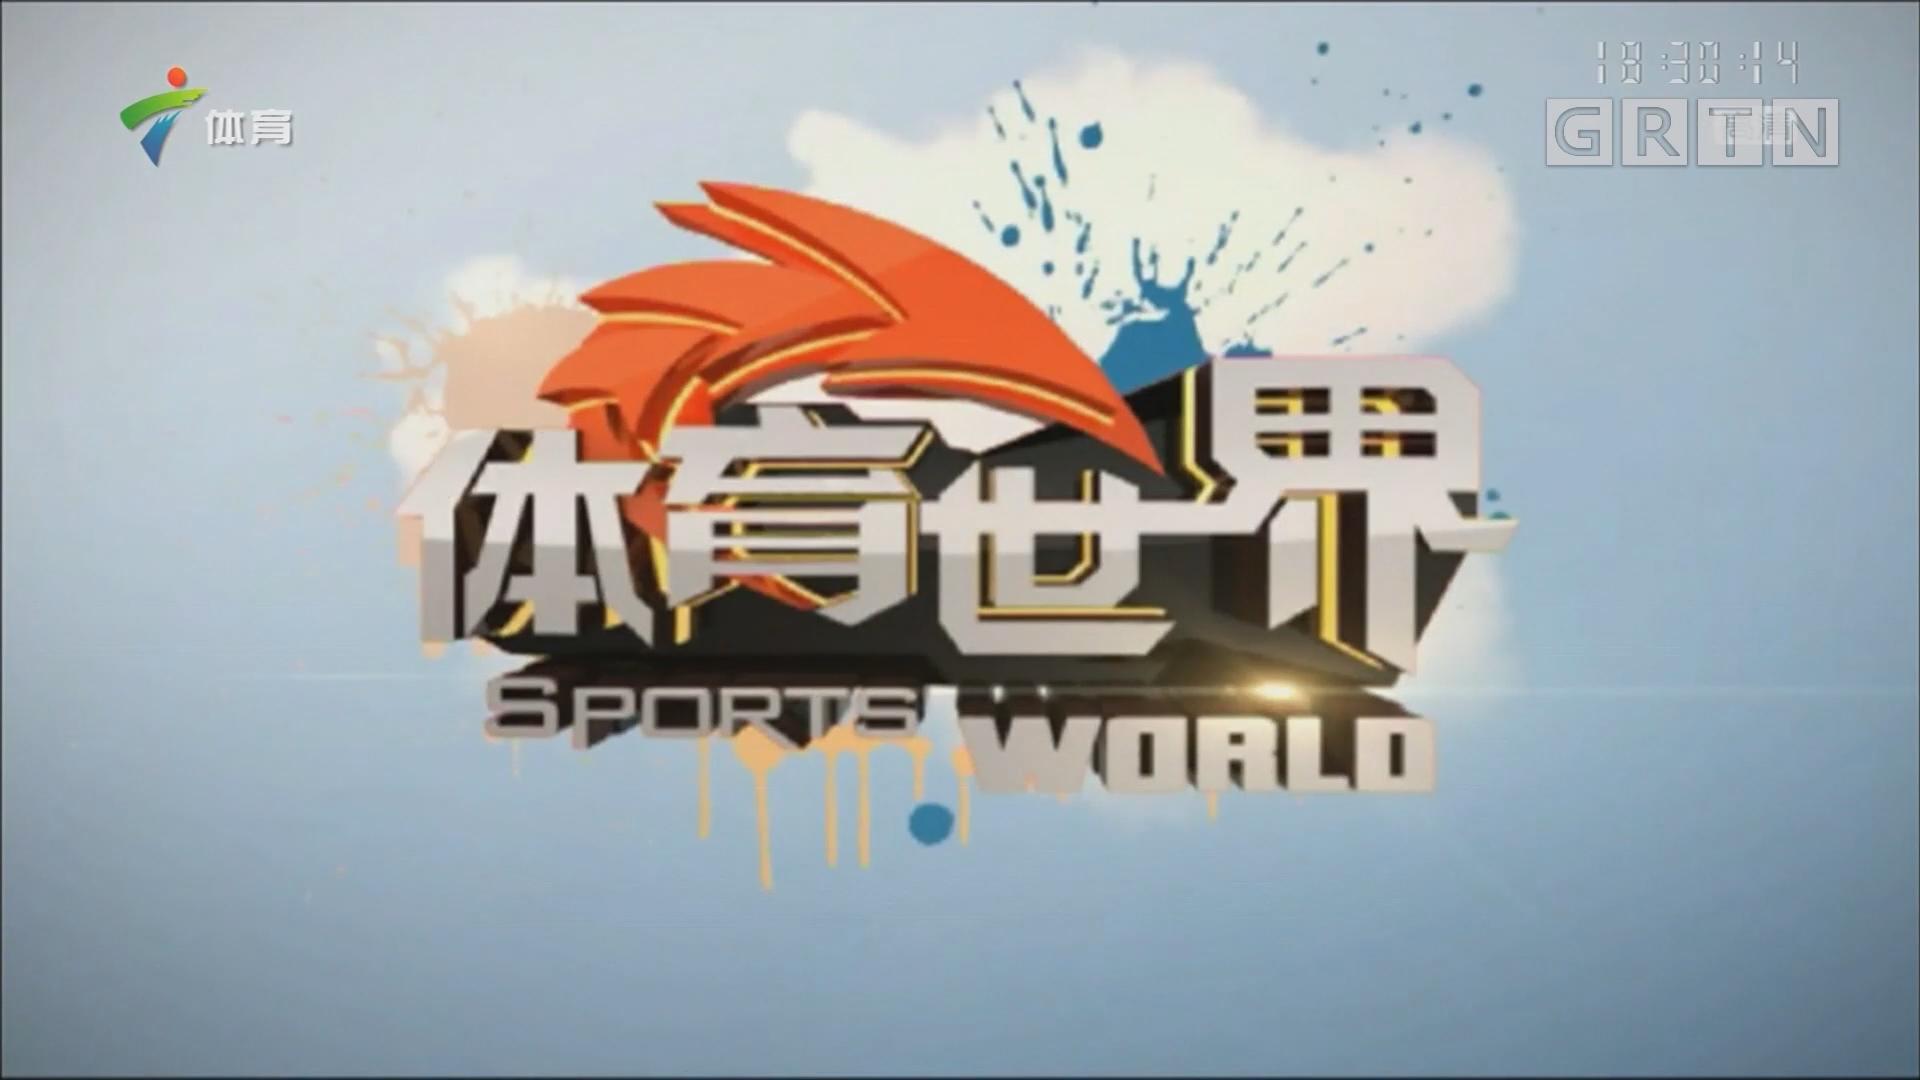 [HD][2018-02-10]体育世界:广东乒乓球队冬训忙